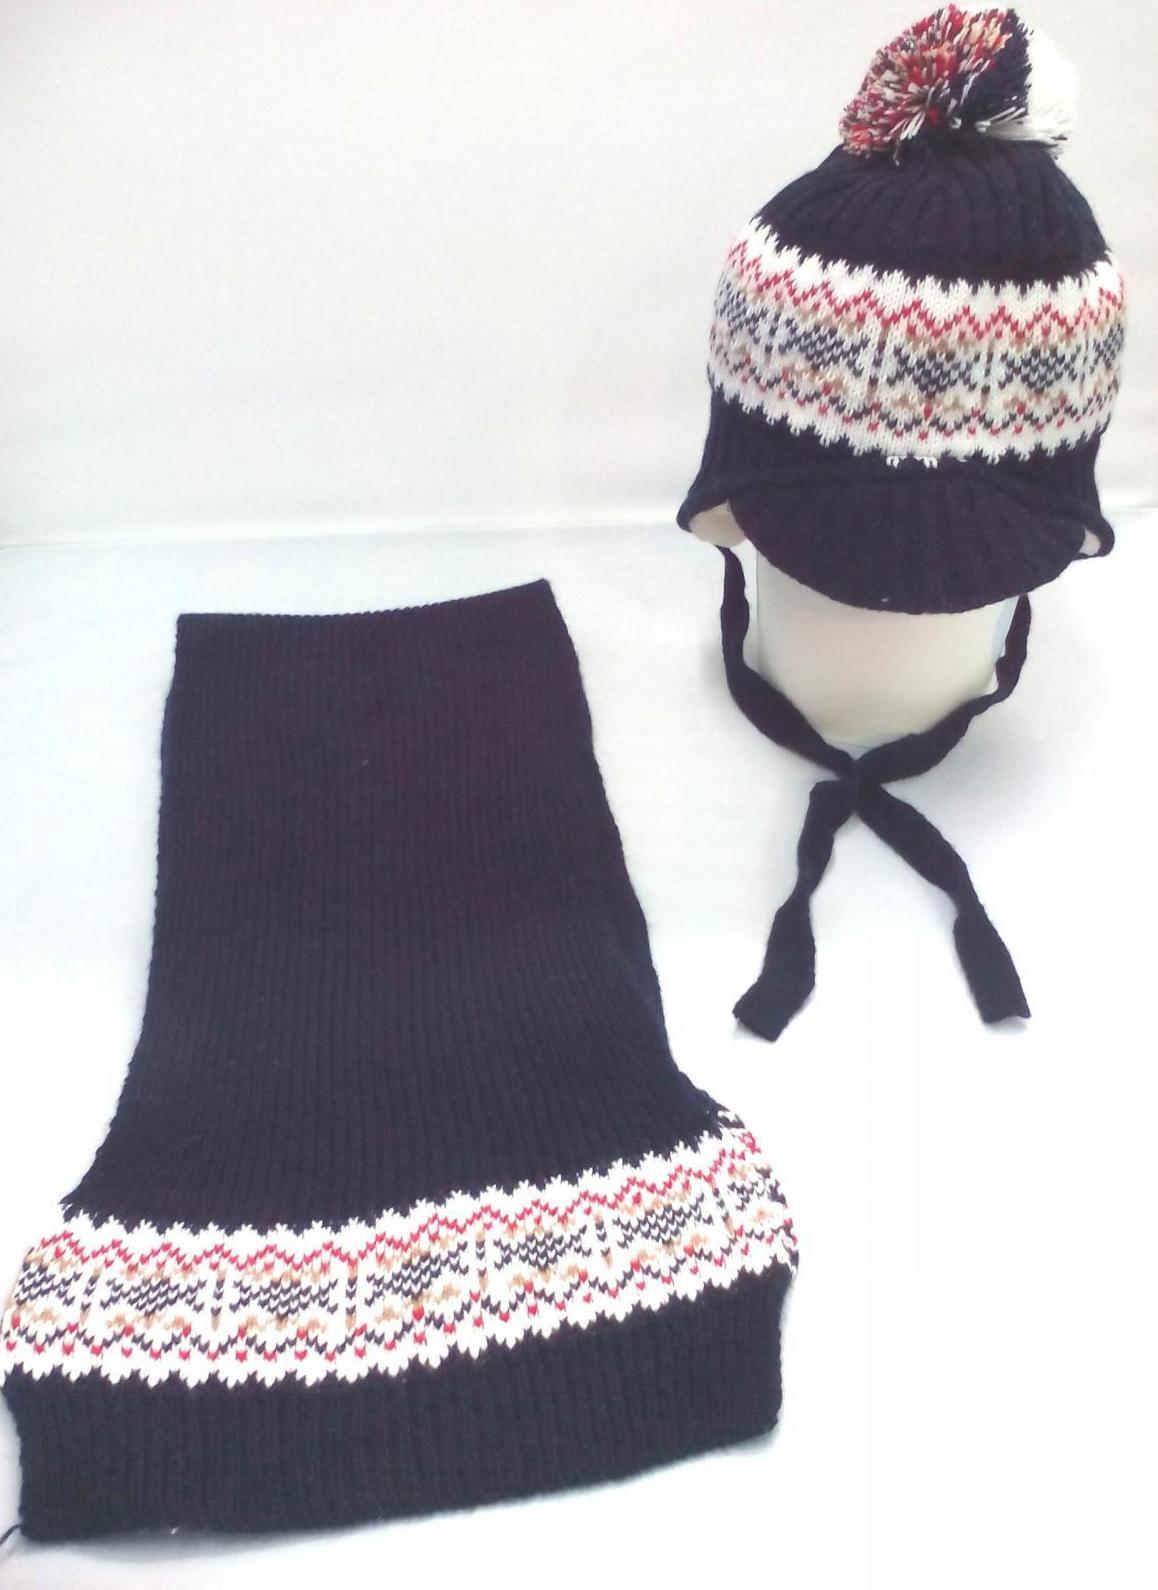 Conjunto de niño de gorro marino con grecany bufanda de Jose Luis Navarro